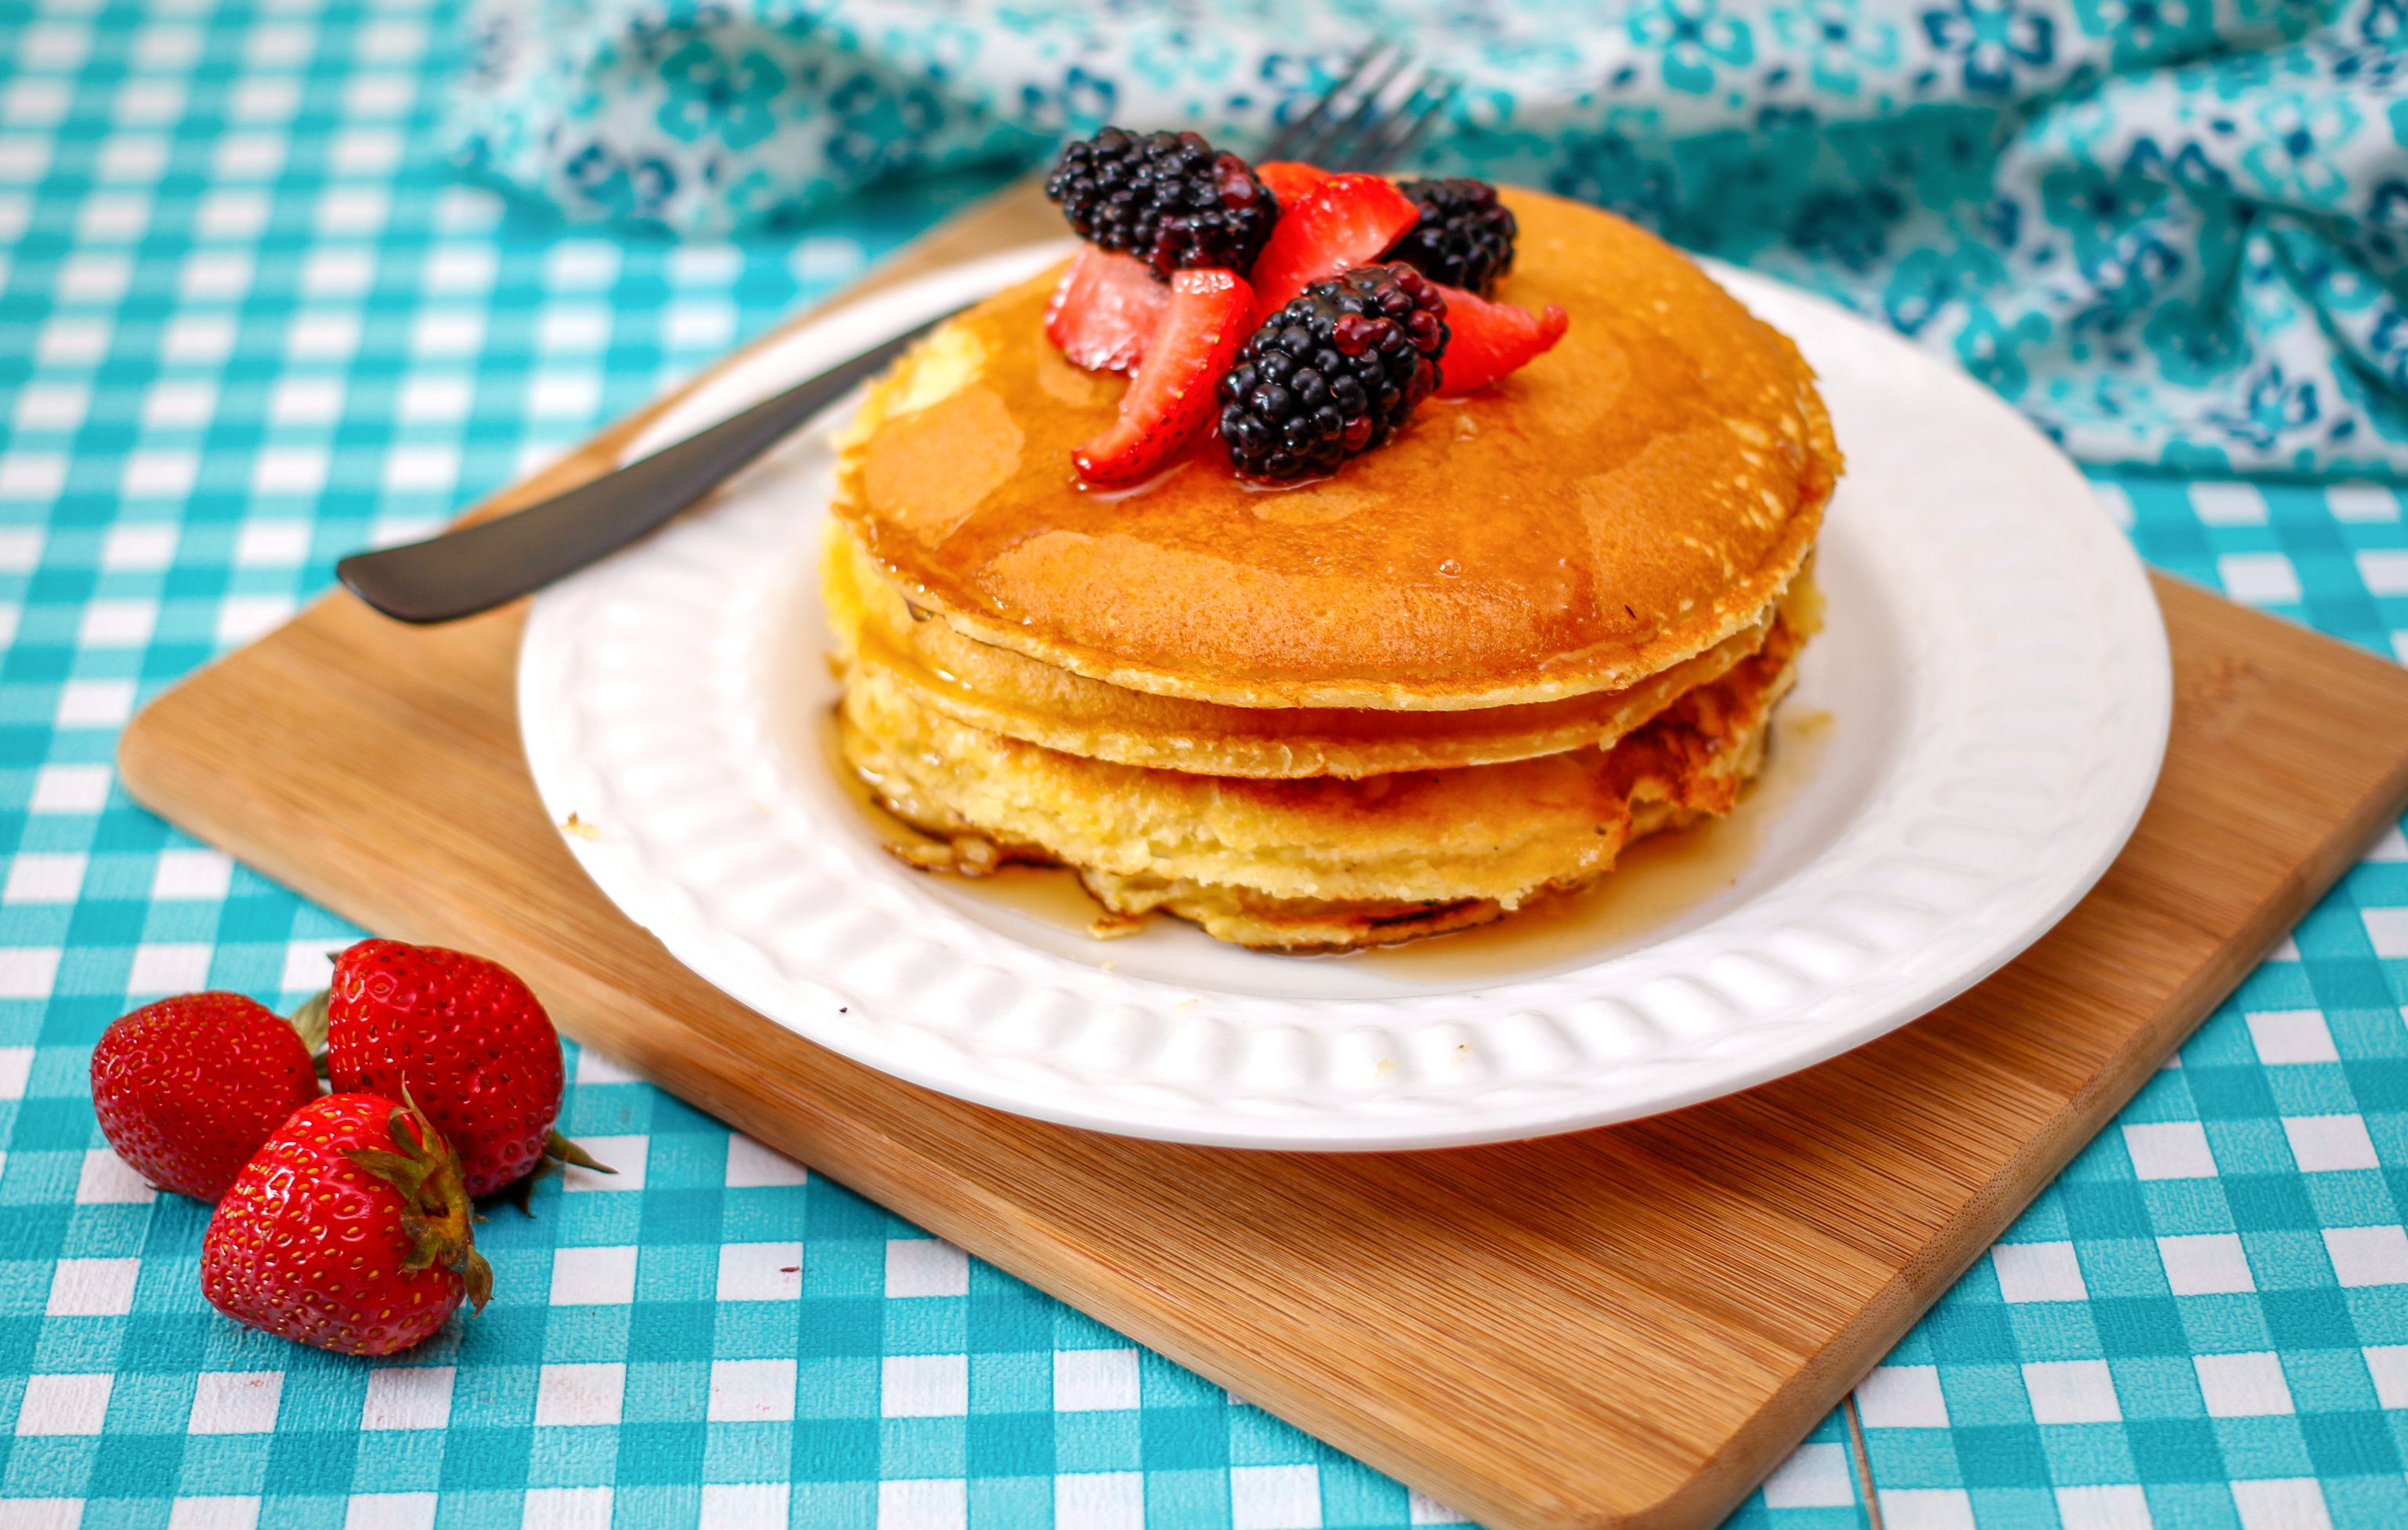 Finished dairy free pancakes